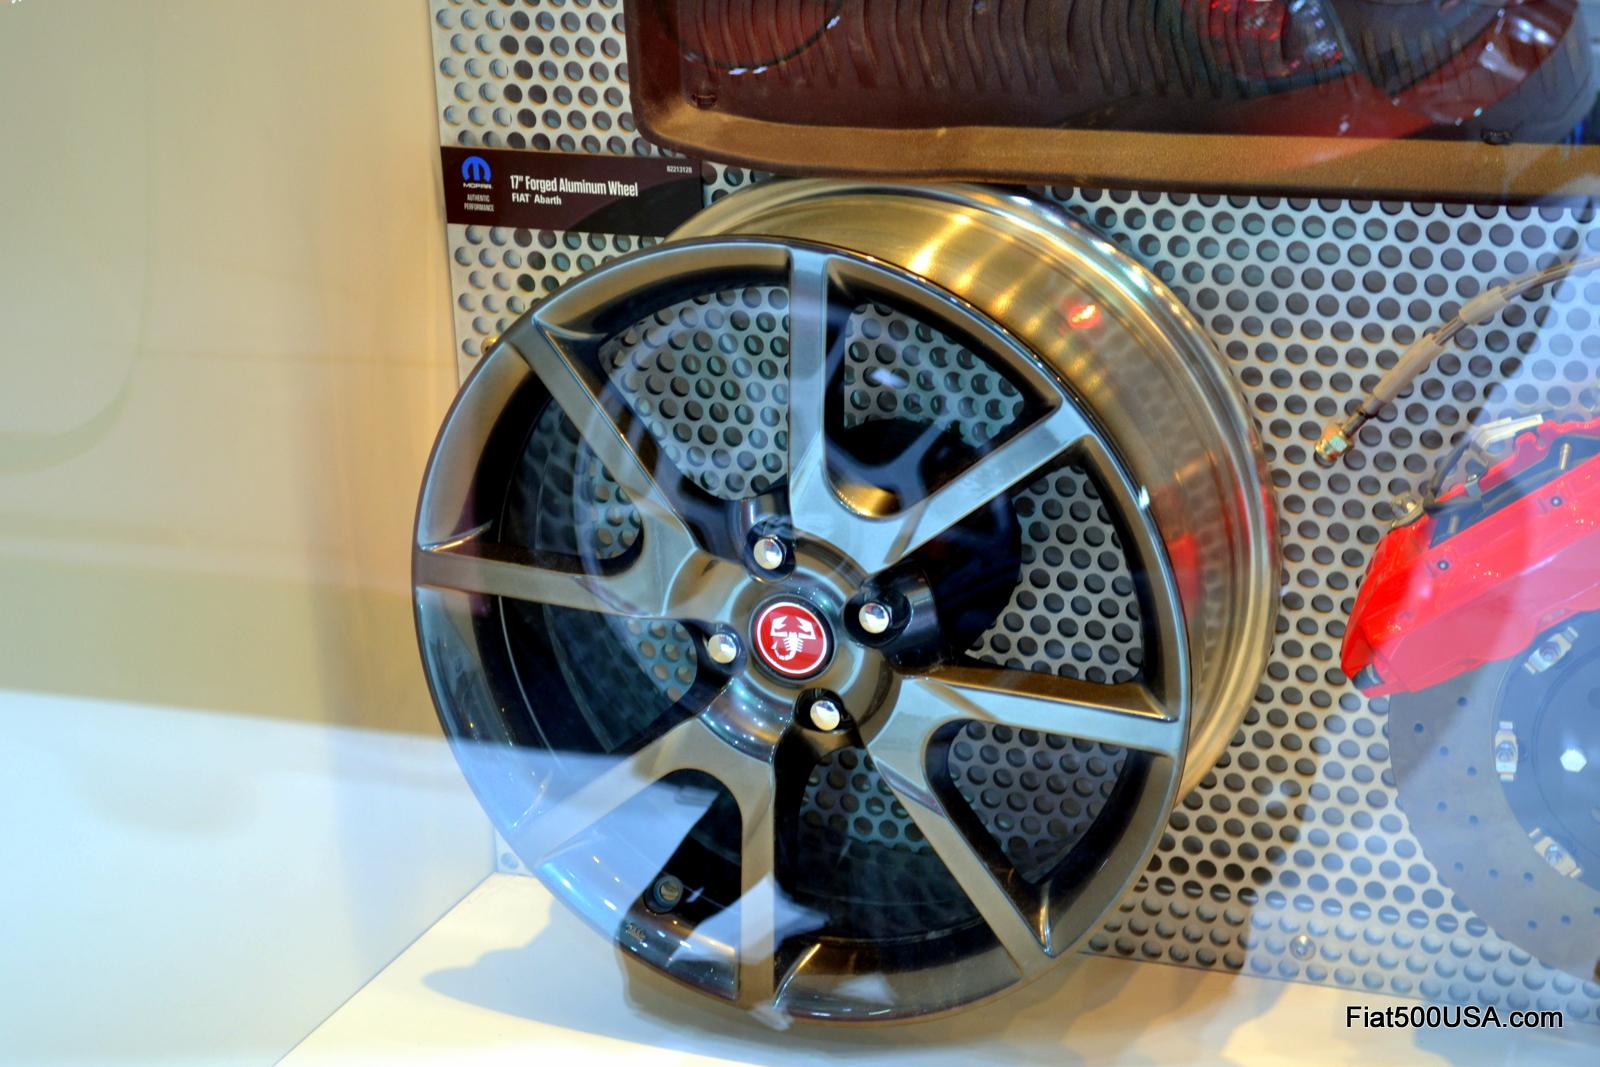 Fiat 500 USA: January 2013